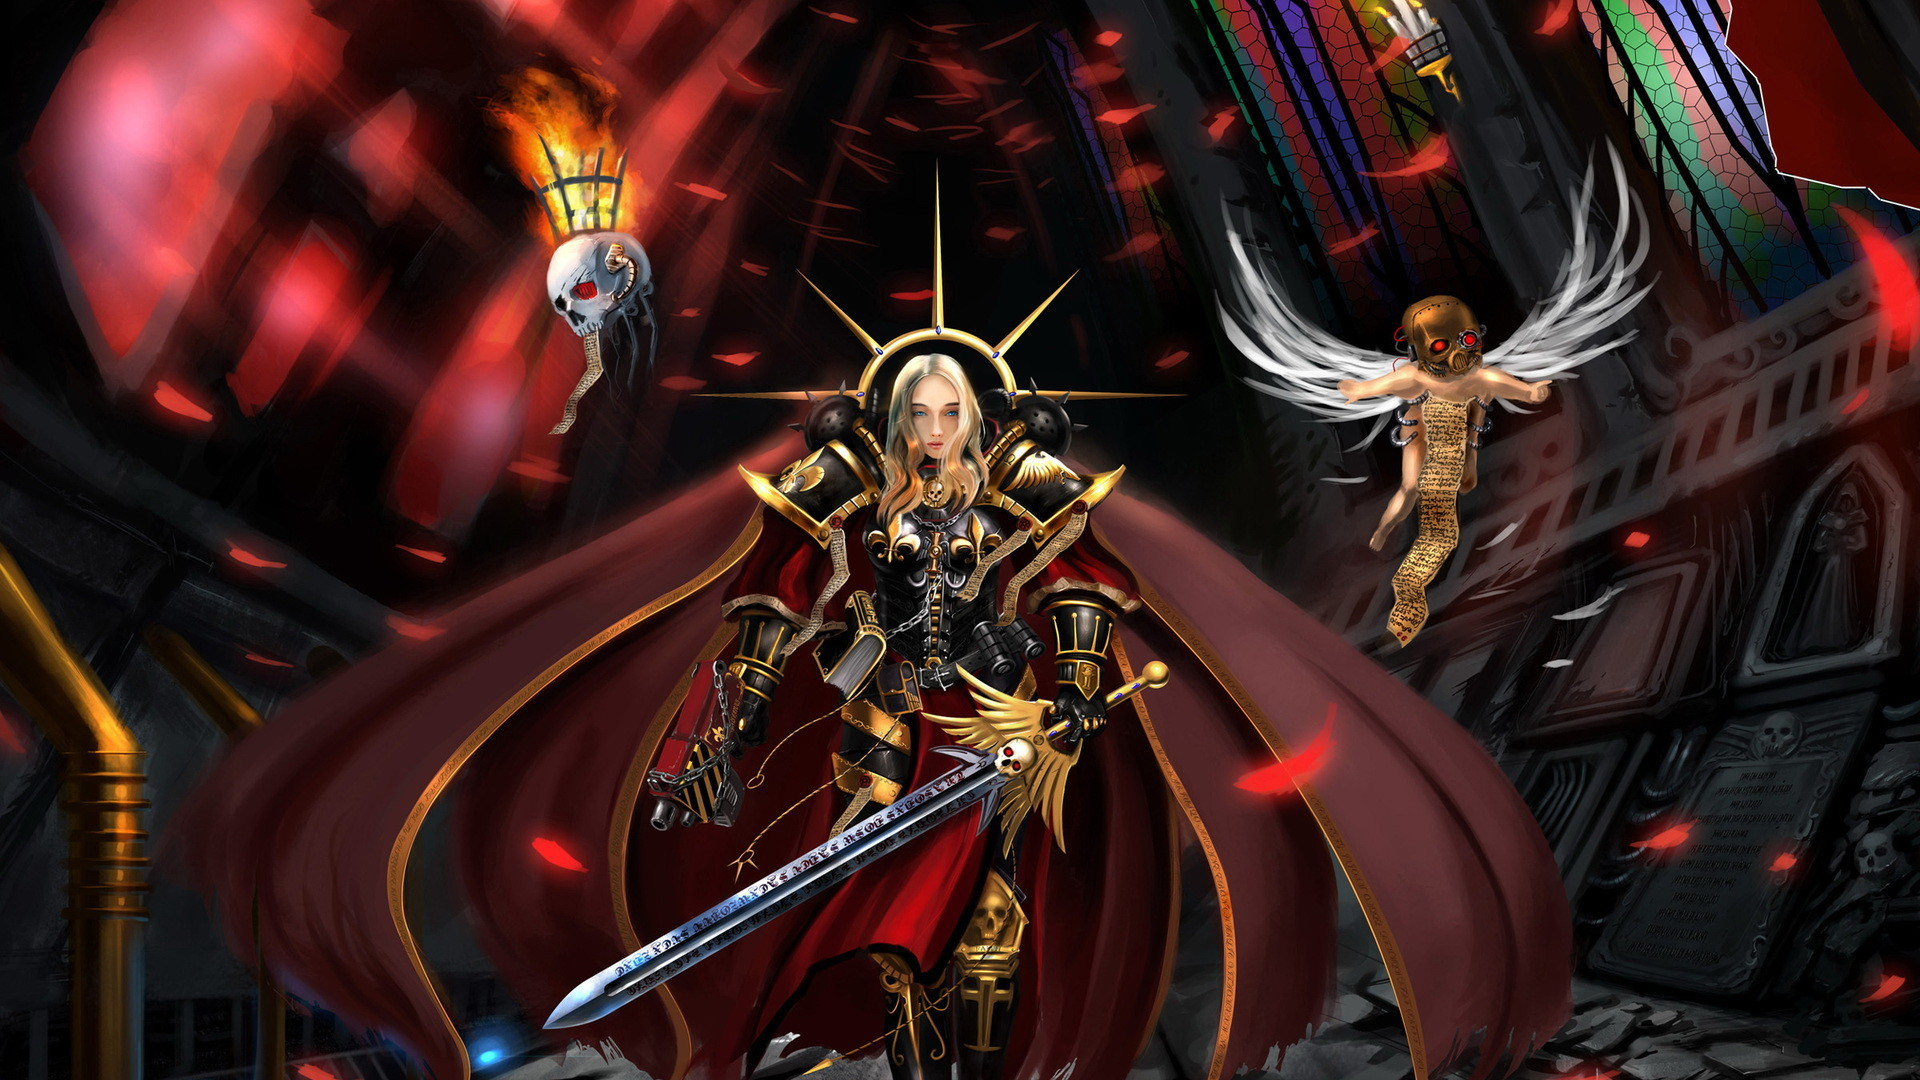 Warhammer 40k sci fi science fantasy warriors weapons sword armor dark  skulls angels evil wallpaper | | 37468 | WallpaperUP